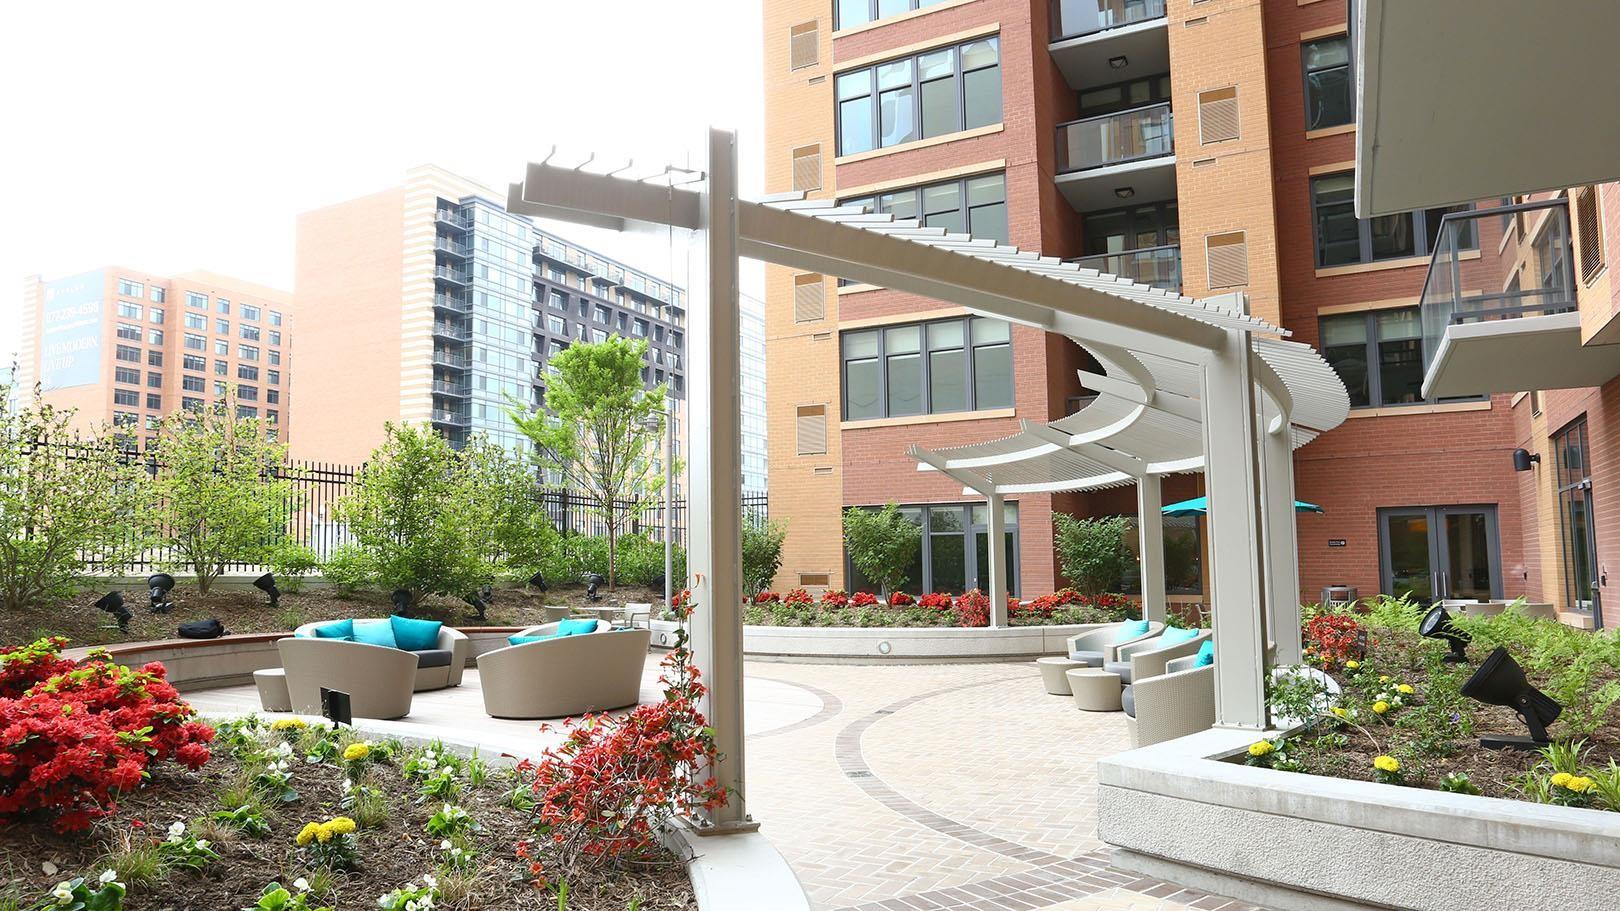 Camden noma apartments for rent 60 l st ne washington for Camden washington dc